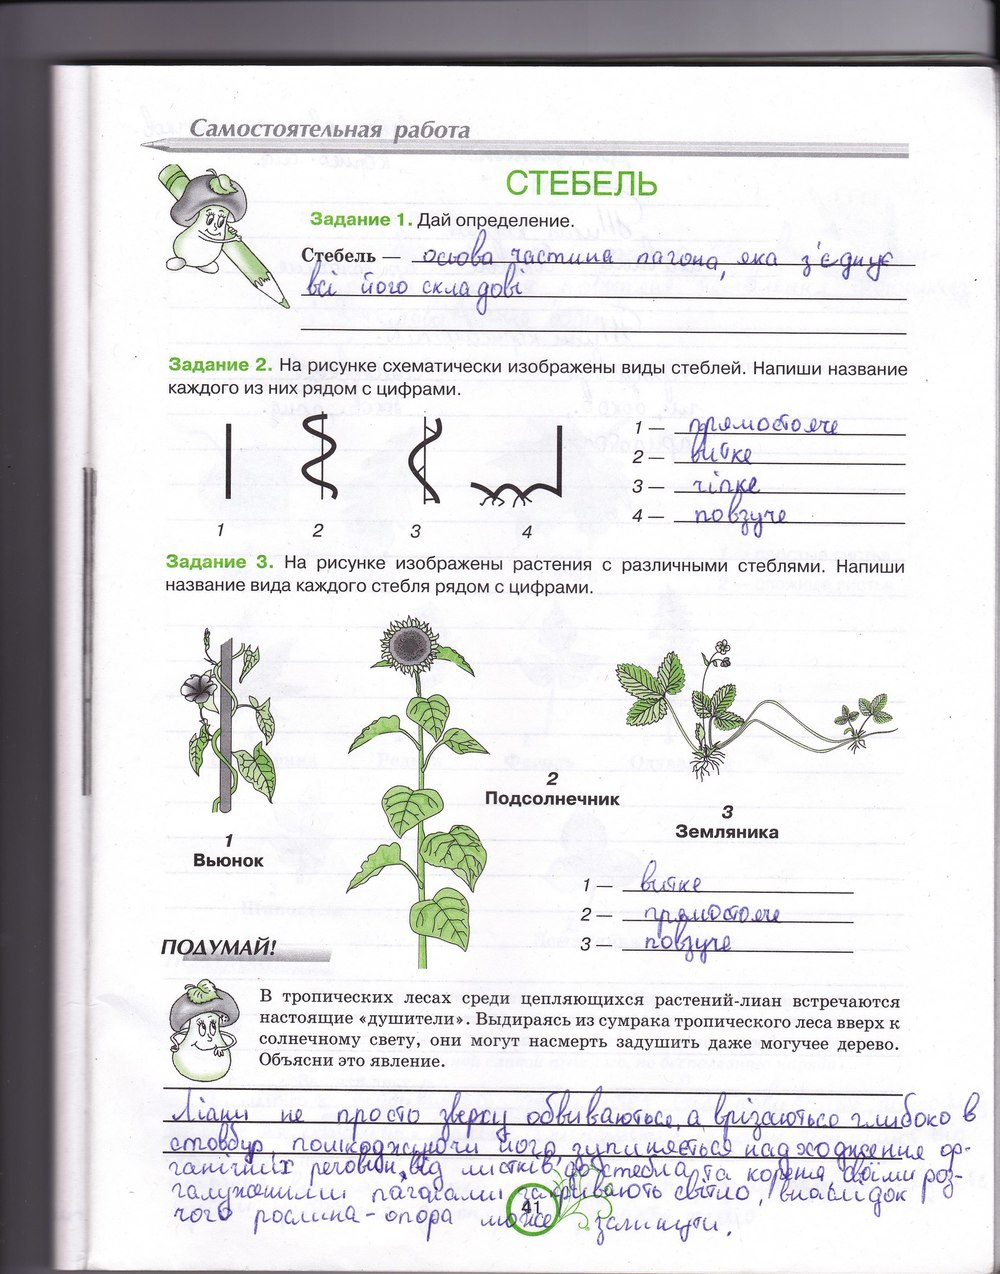 Рабочая класс тетрадь 6 андерсон гдз биология